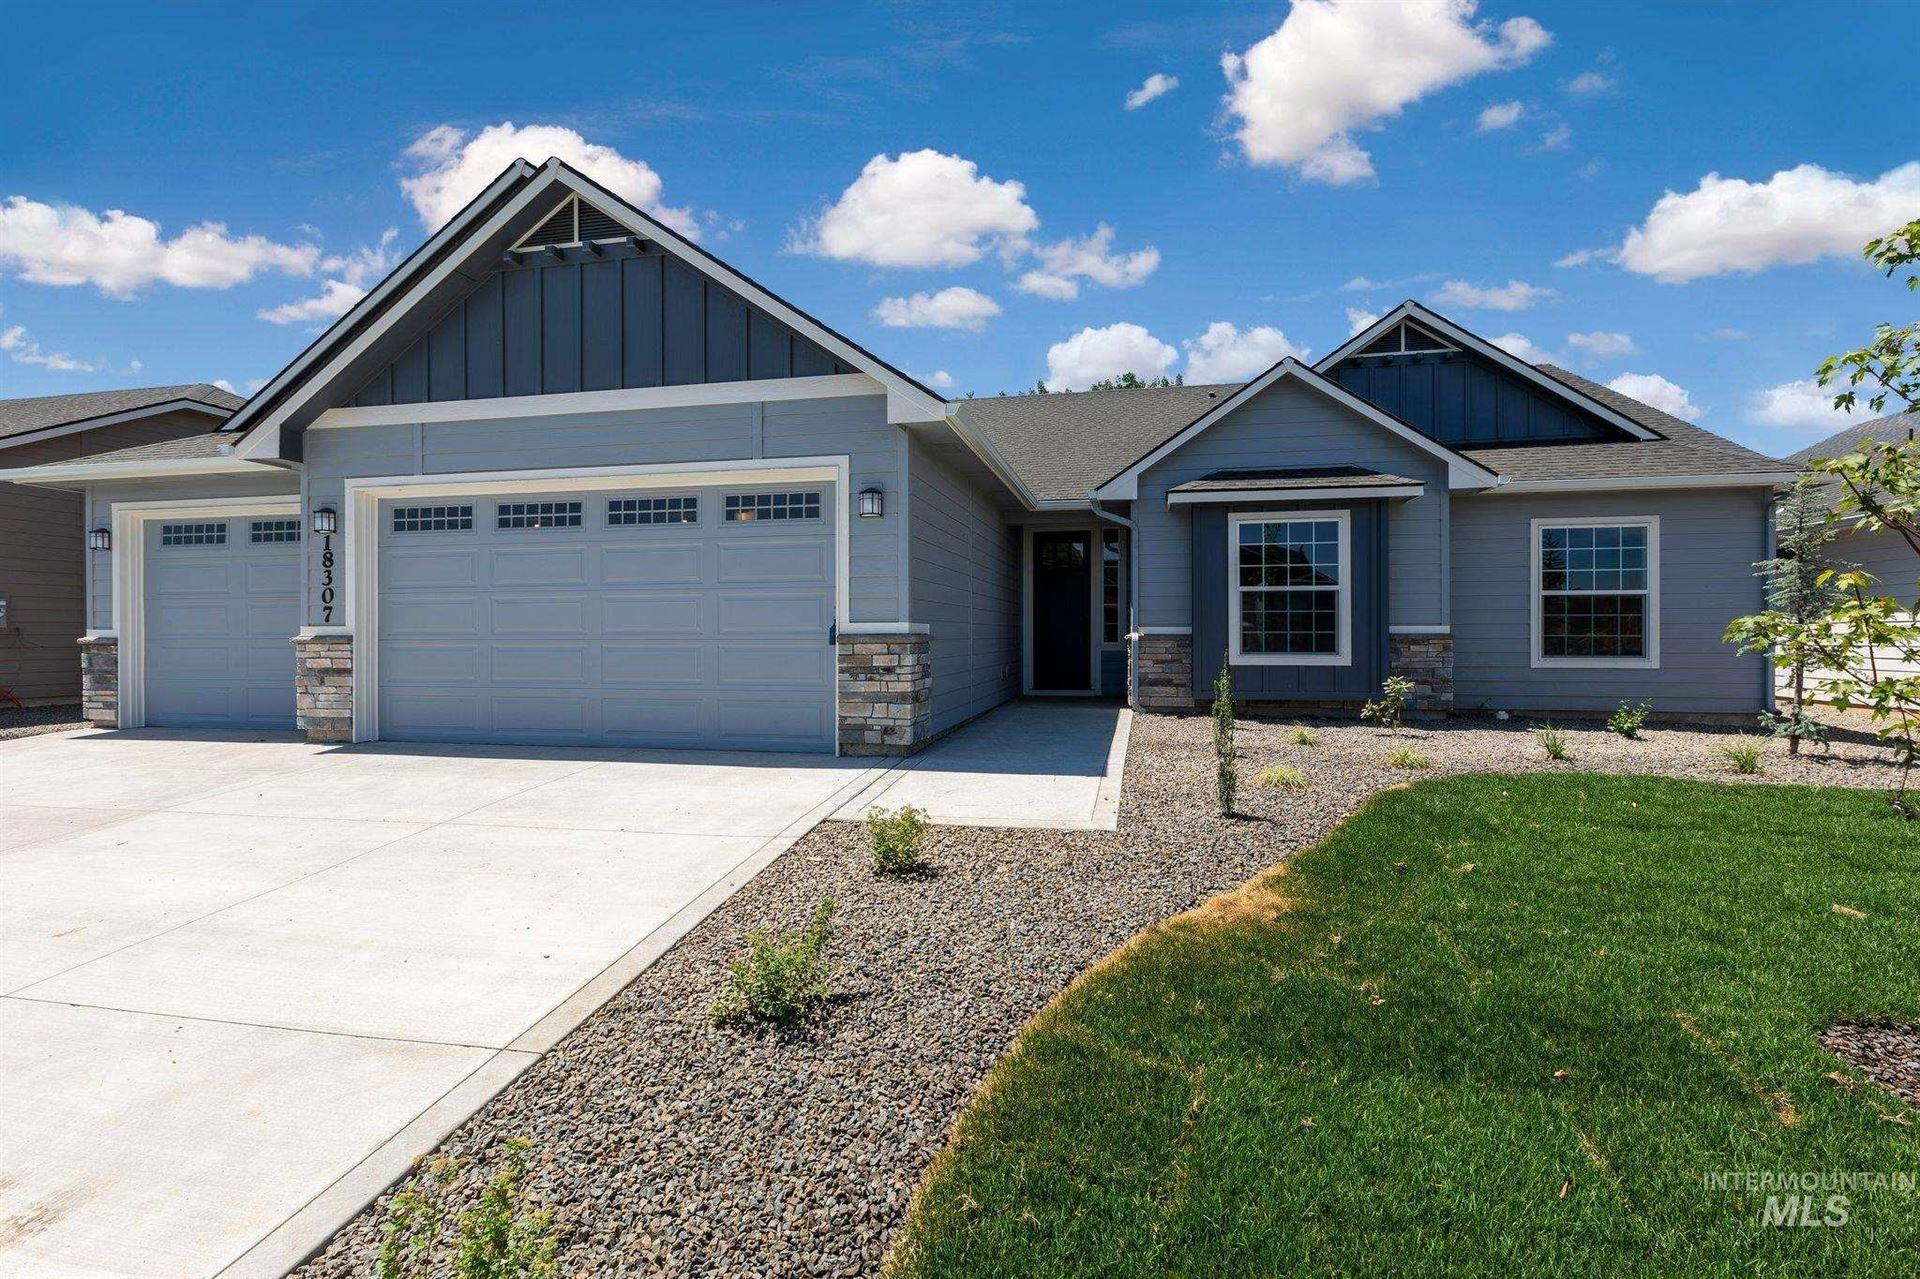 18307 N Wild Goose Avenue, Nampa, ID 83687 - MLS#: 98810229